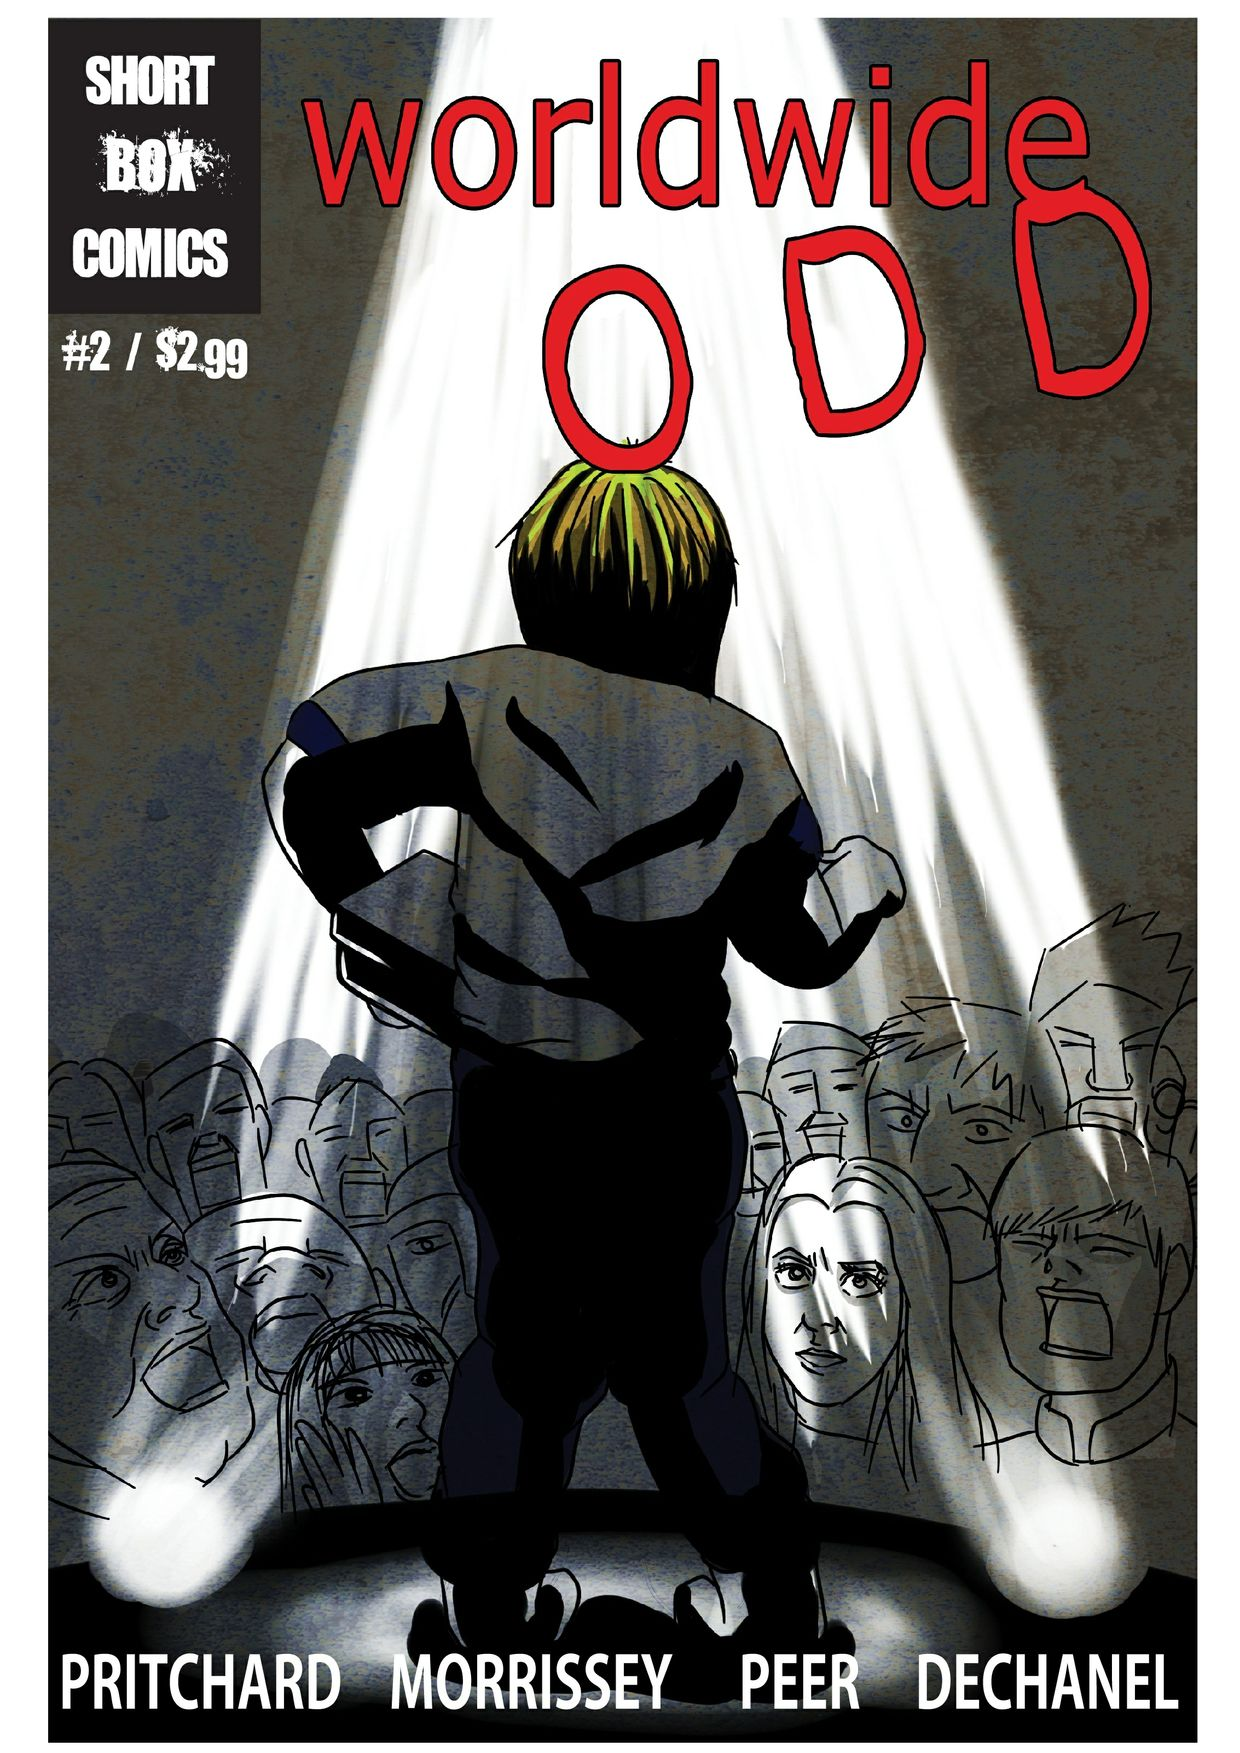 Worldwide Odd #2